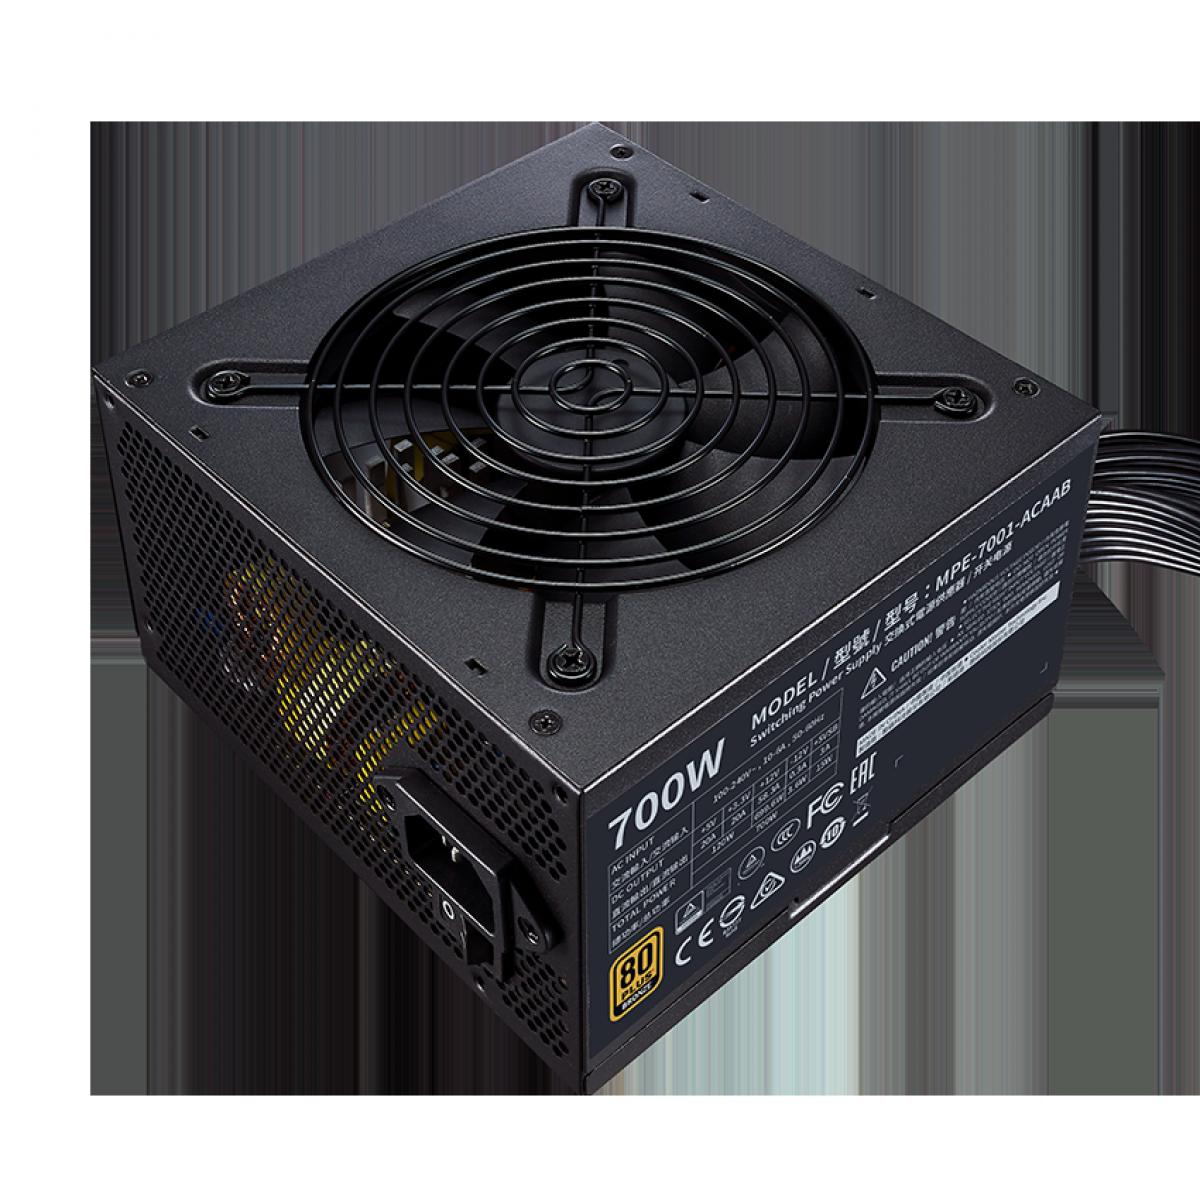 Fonte Cooler Master MWE V2 700W, 80 Plus Bronze, PFC Ativo, MPE-7001-ACAAB-BR - Open Box